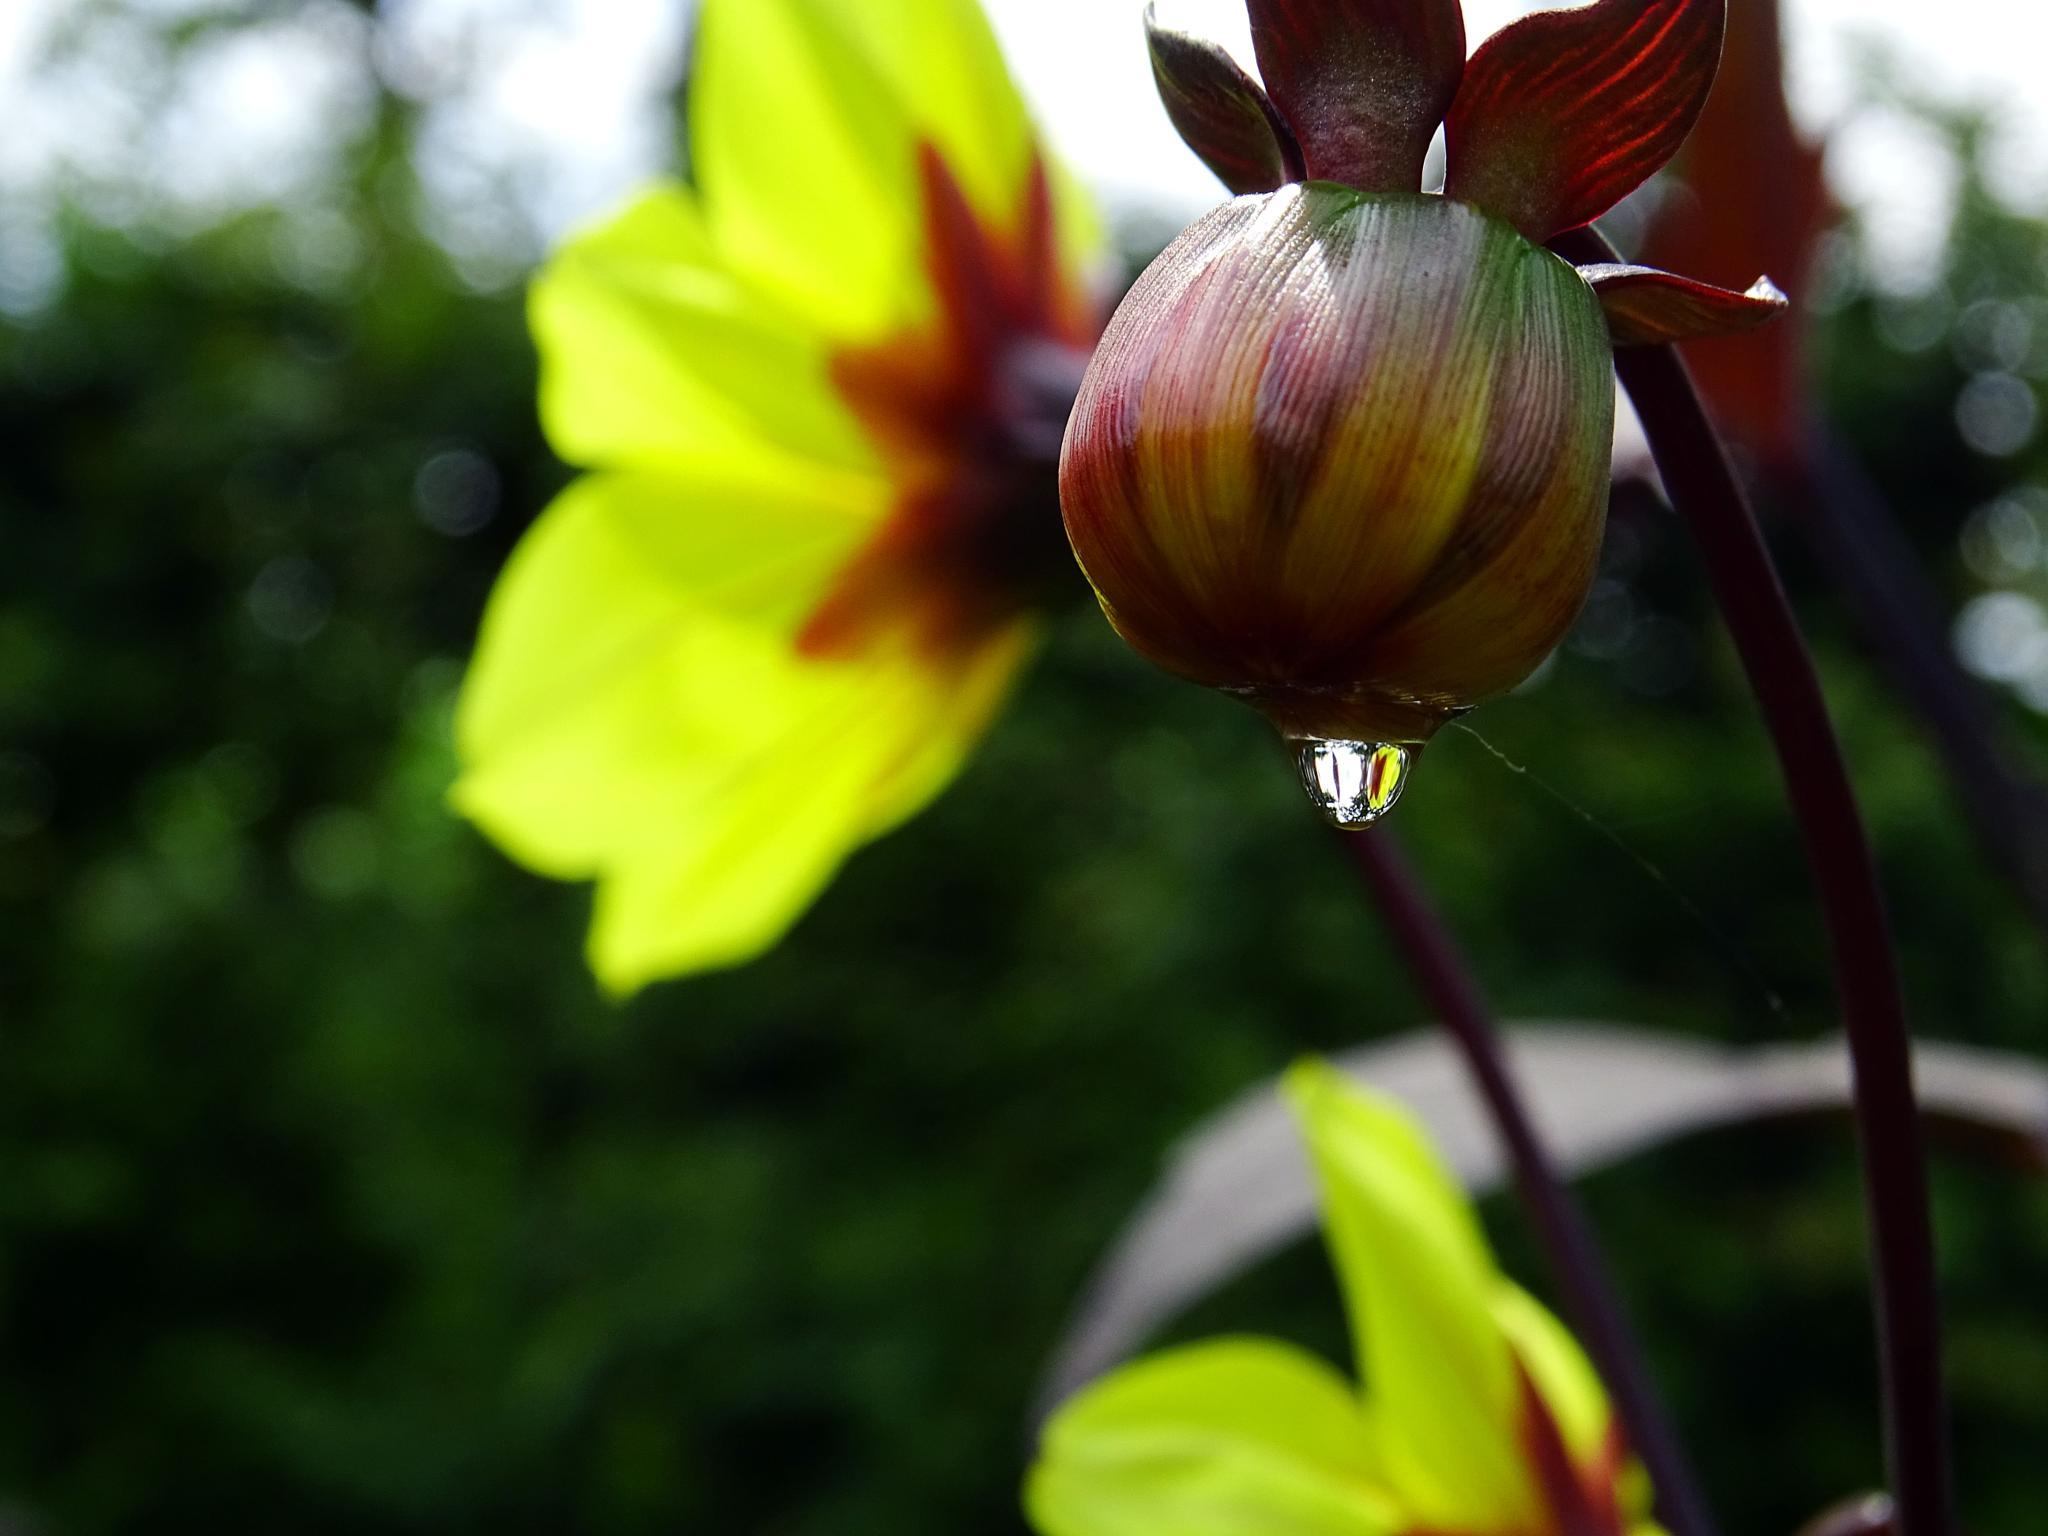 Raindrop by missjoy86